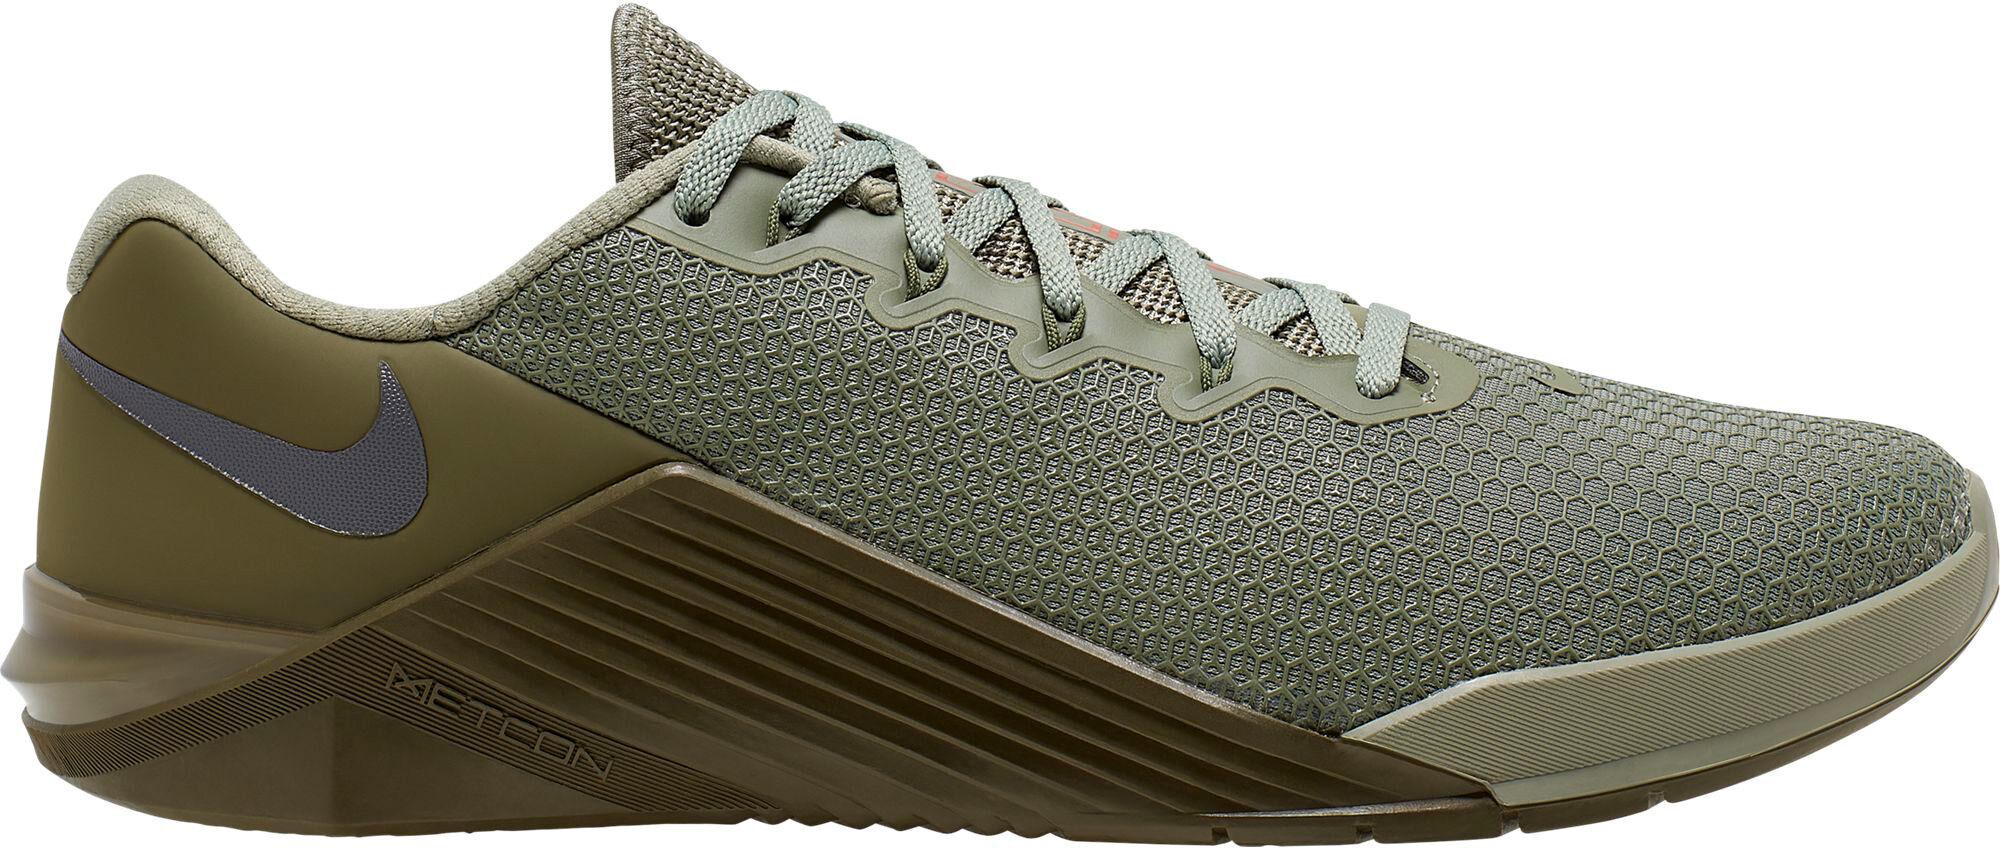 Nike Metcon 5 AMP Damen Trainingsschuh. Nike CH